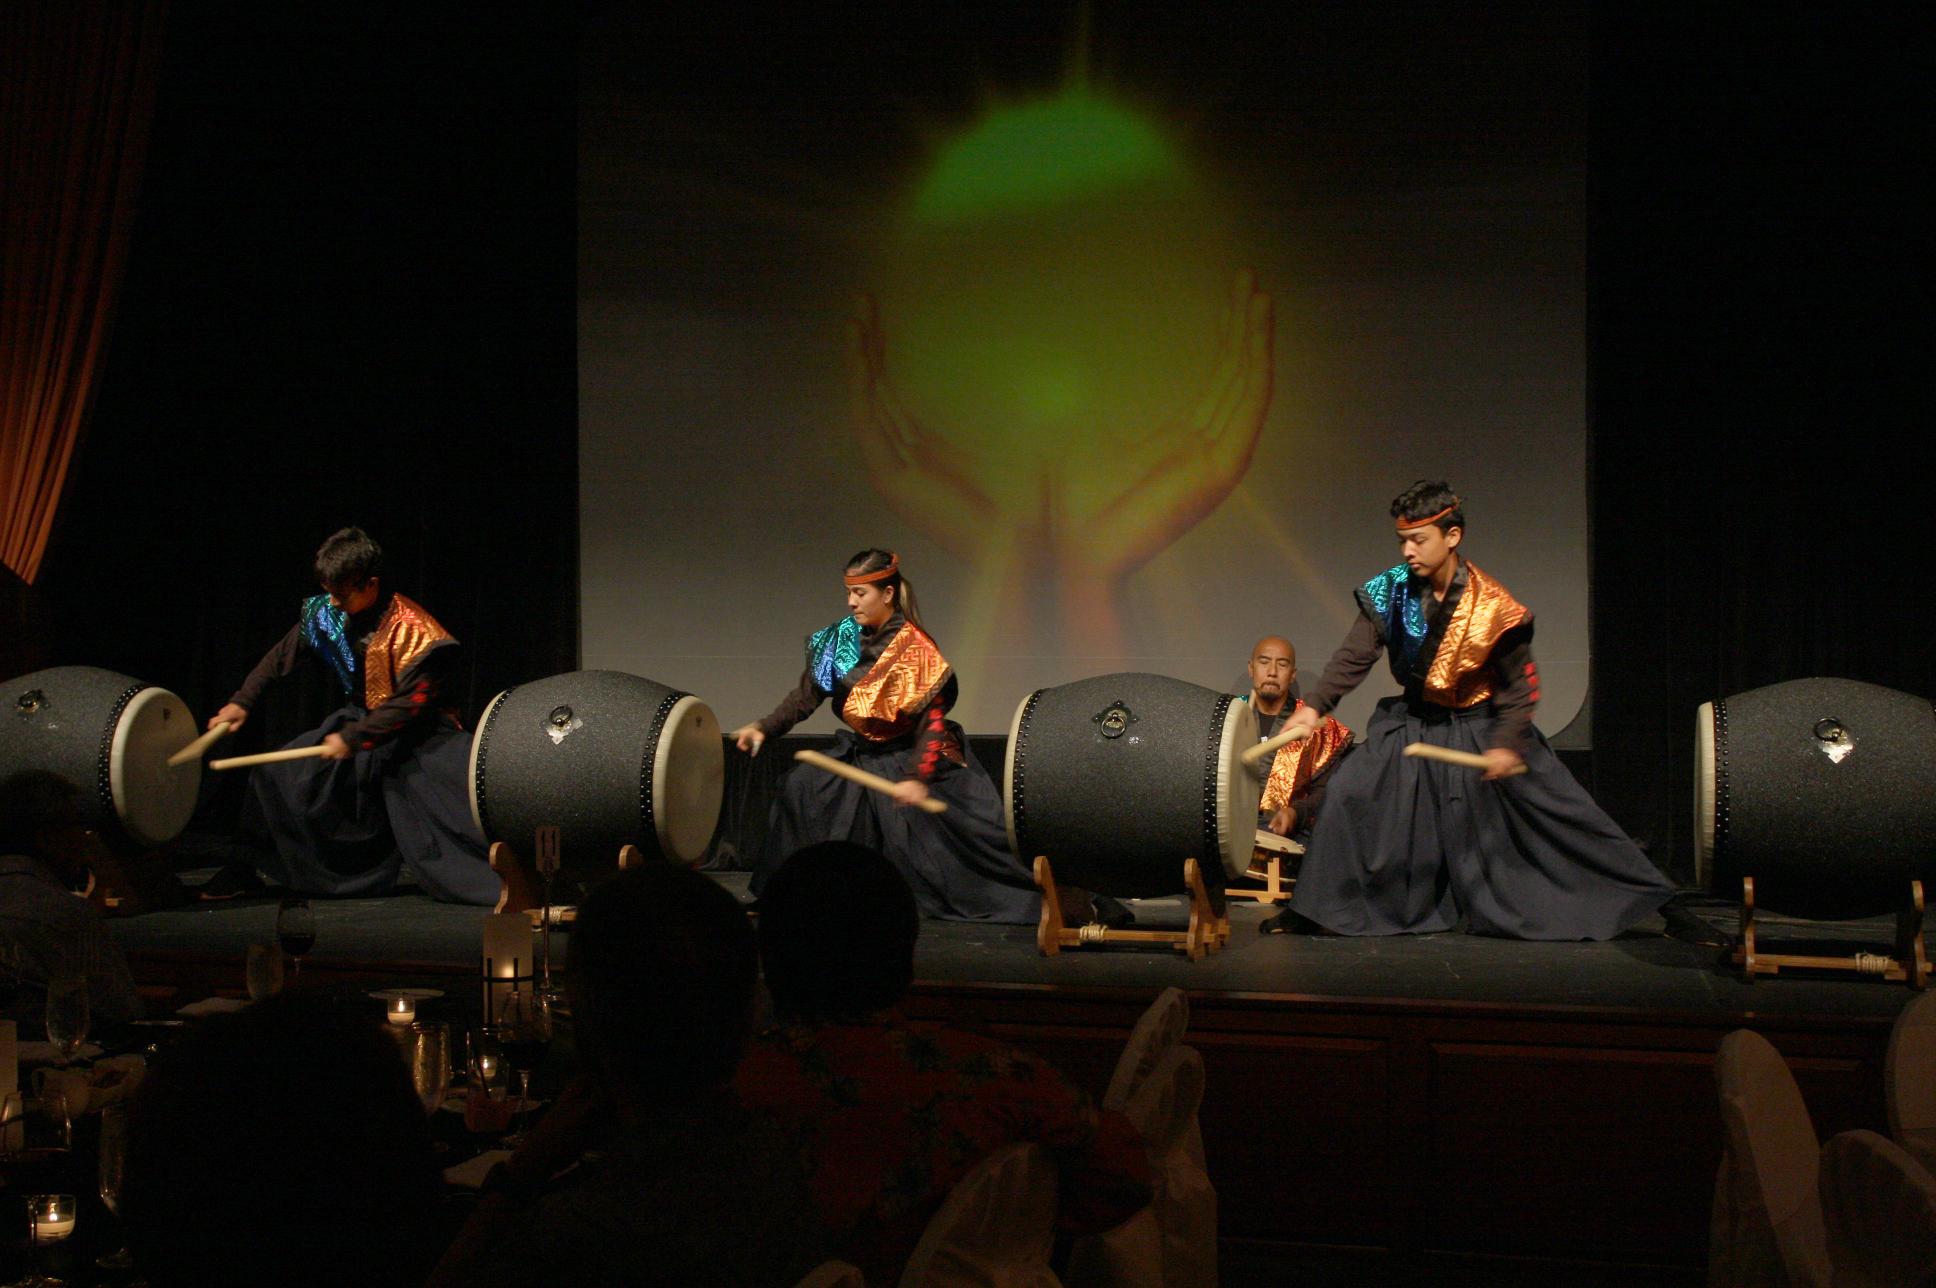 Pacific Buddhist Academy Taiko Performance